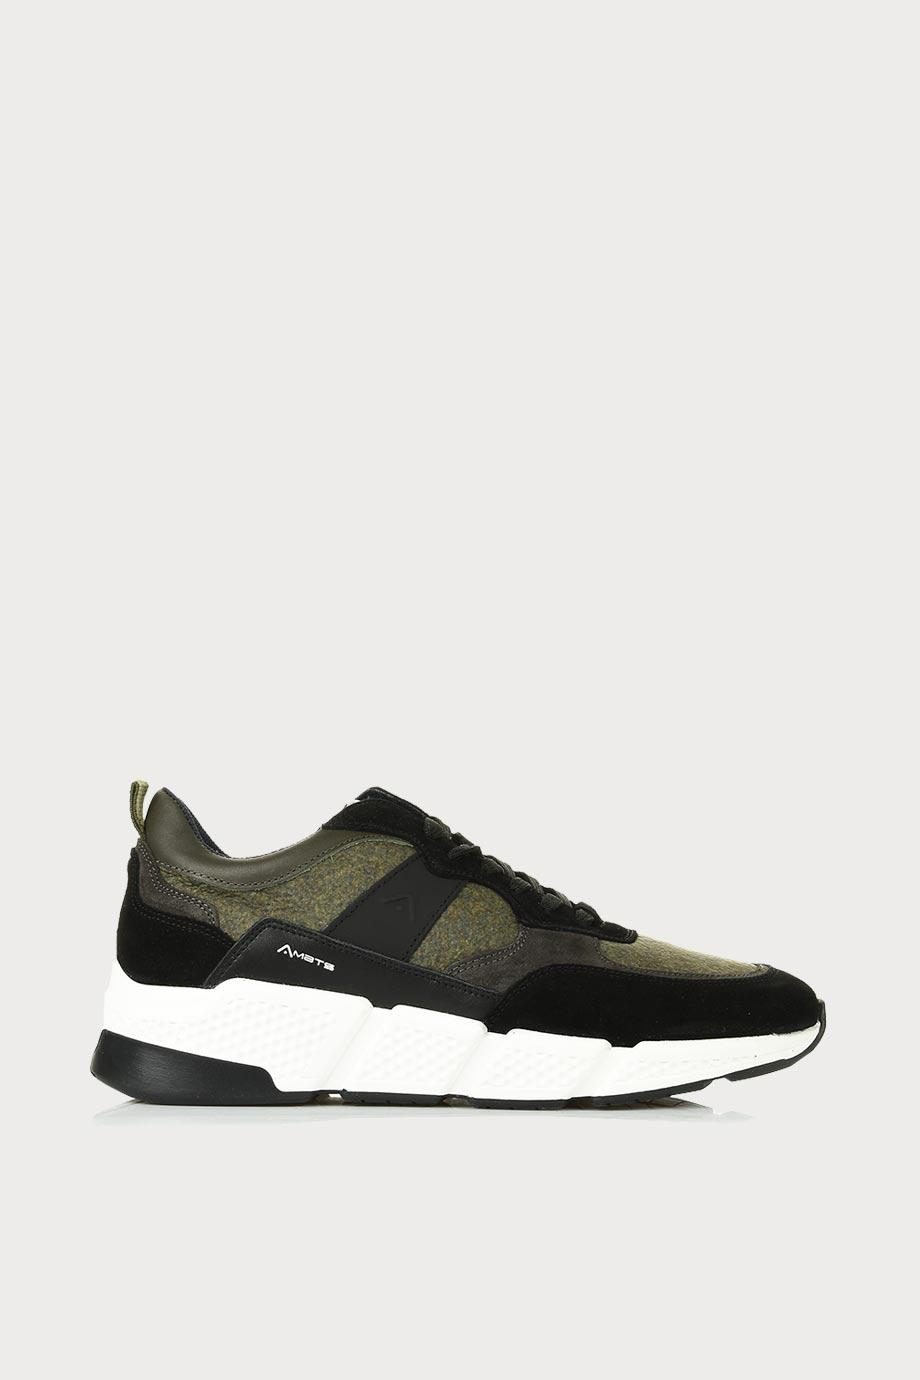 spiridoula metheniti shoes xalkida p ash 0W1 080 113 black kaki sneakers ambitious